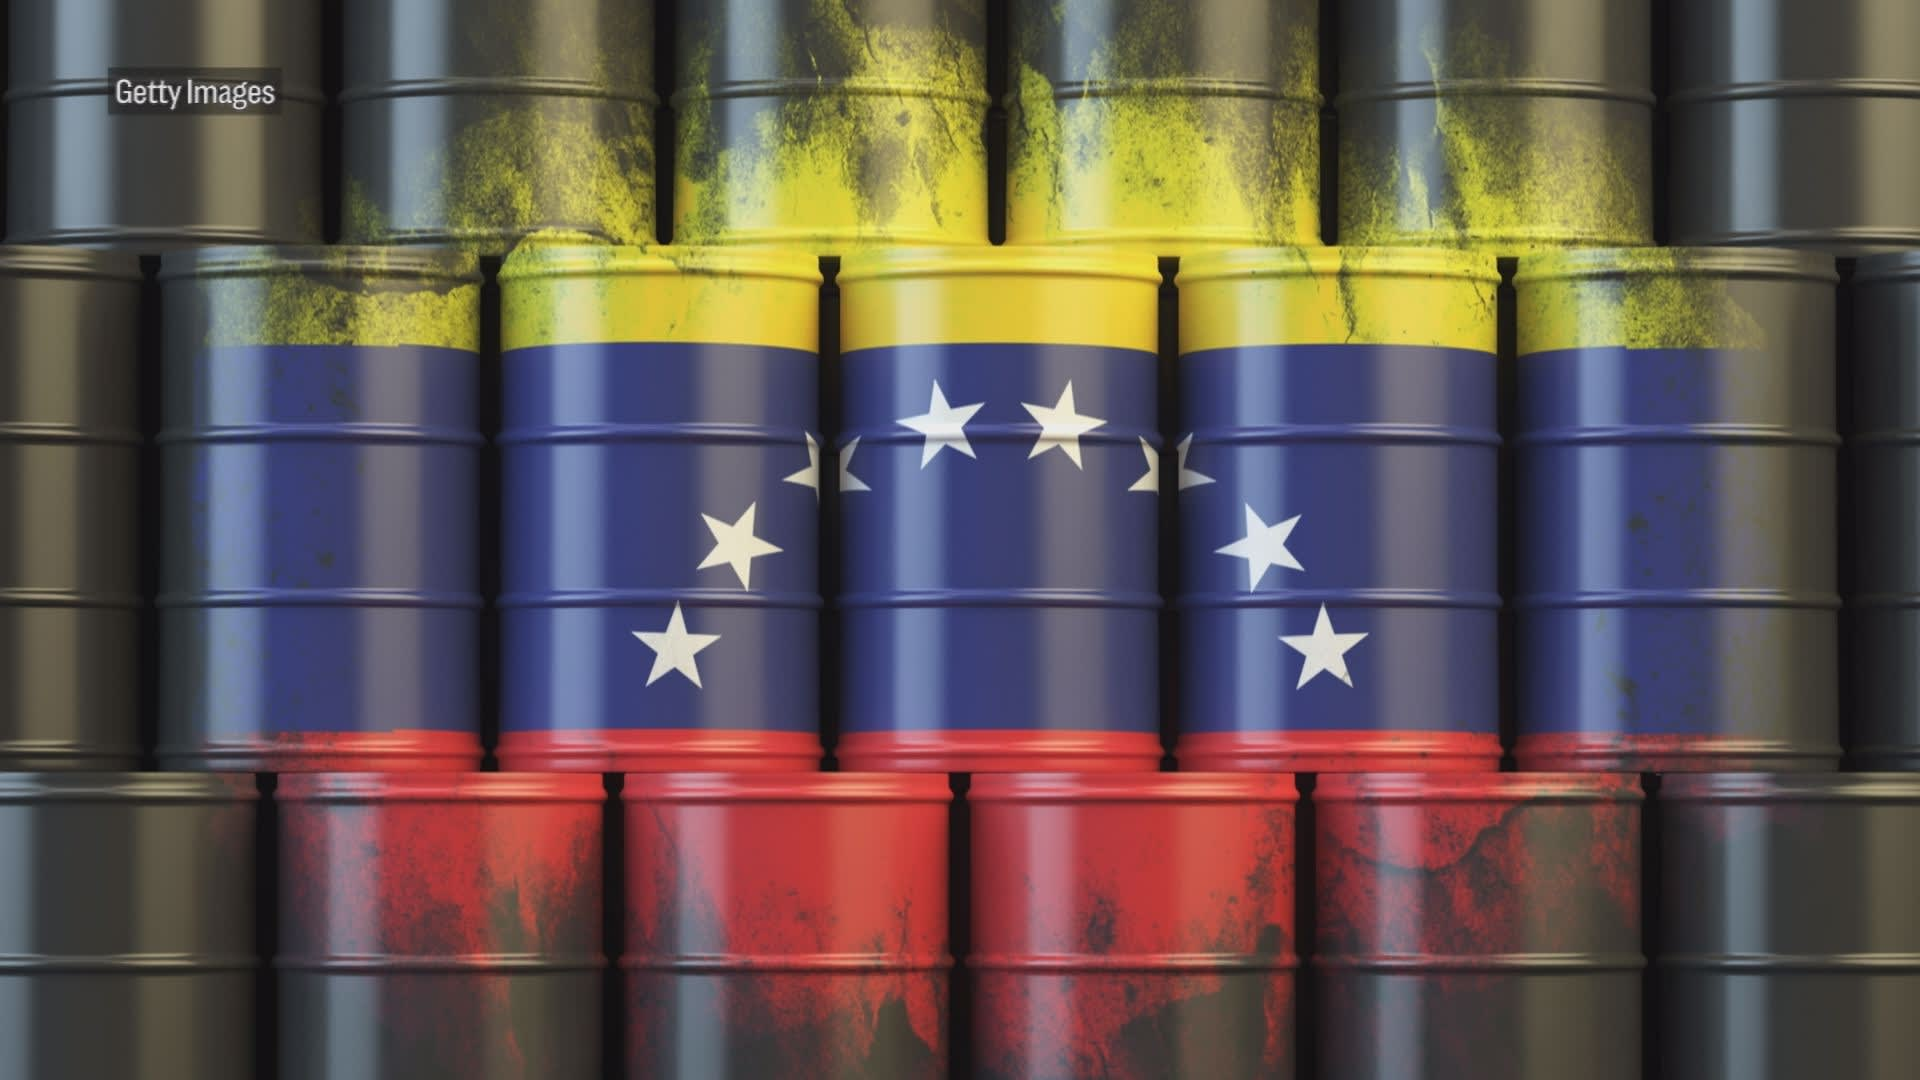 Conoco moves to take over Venezuelan PDVSAs Caribbean assets Sources 1920x1080